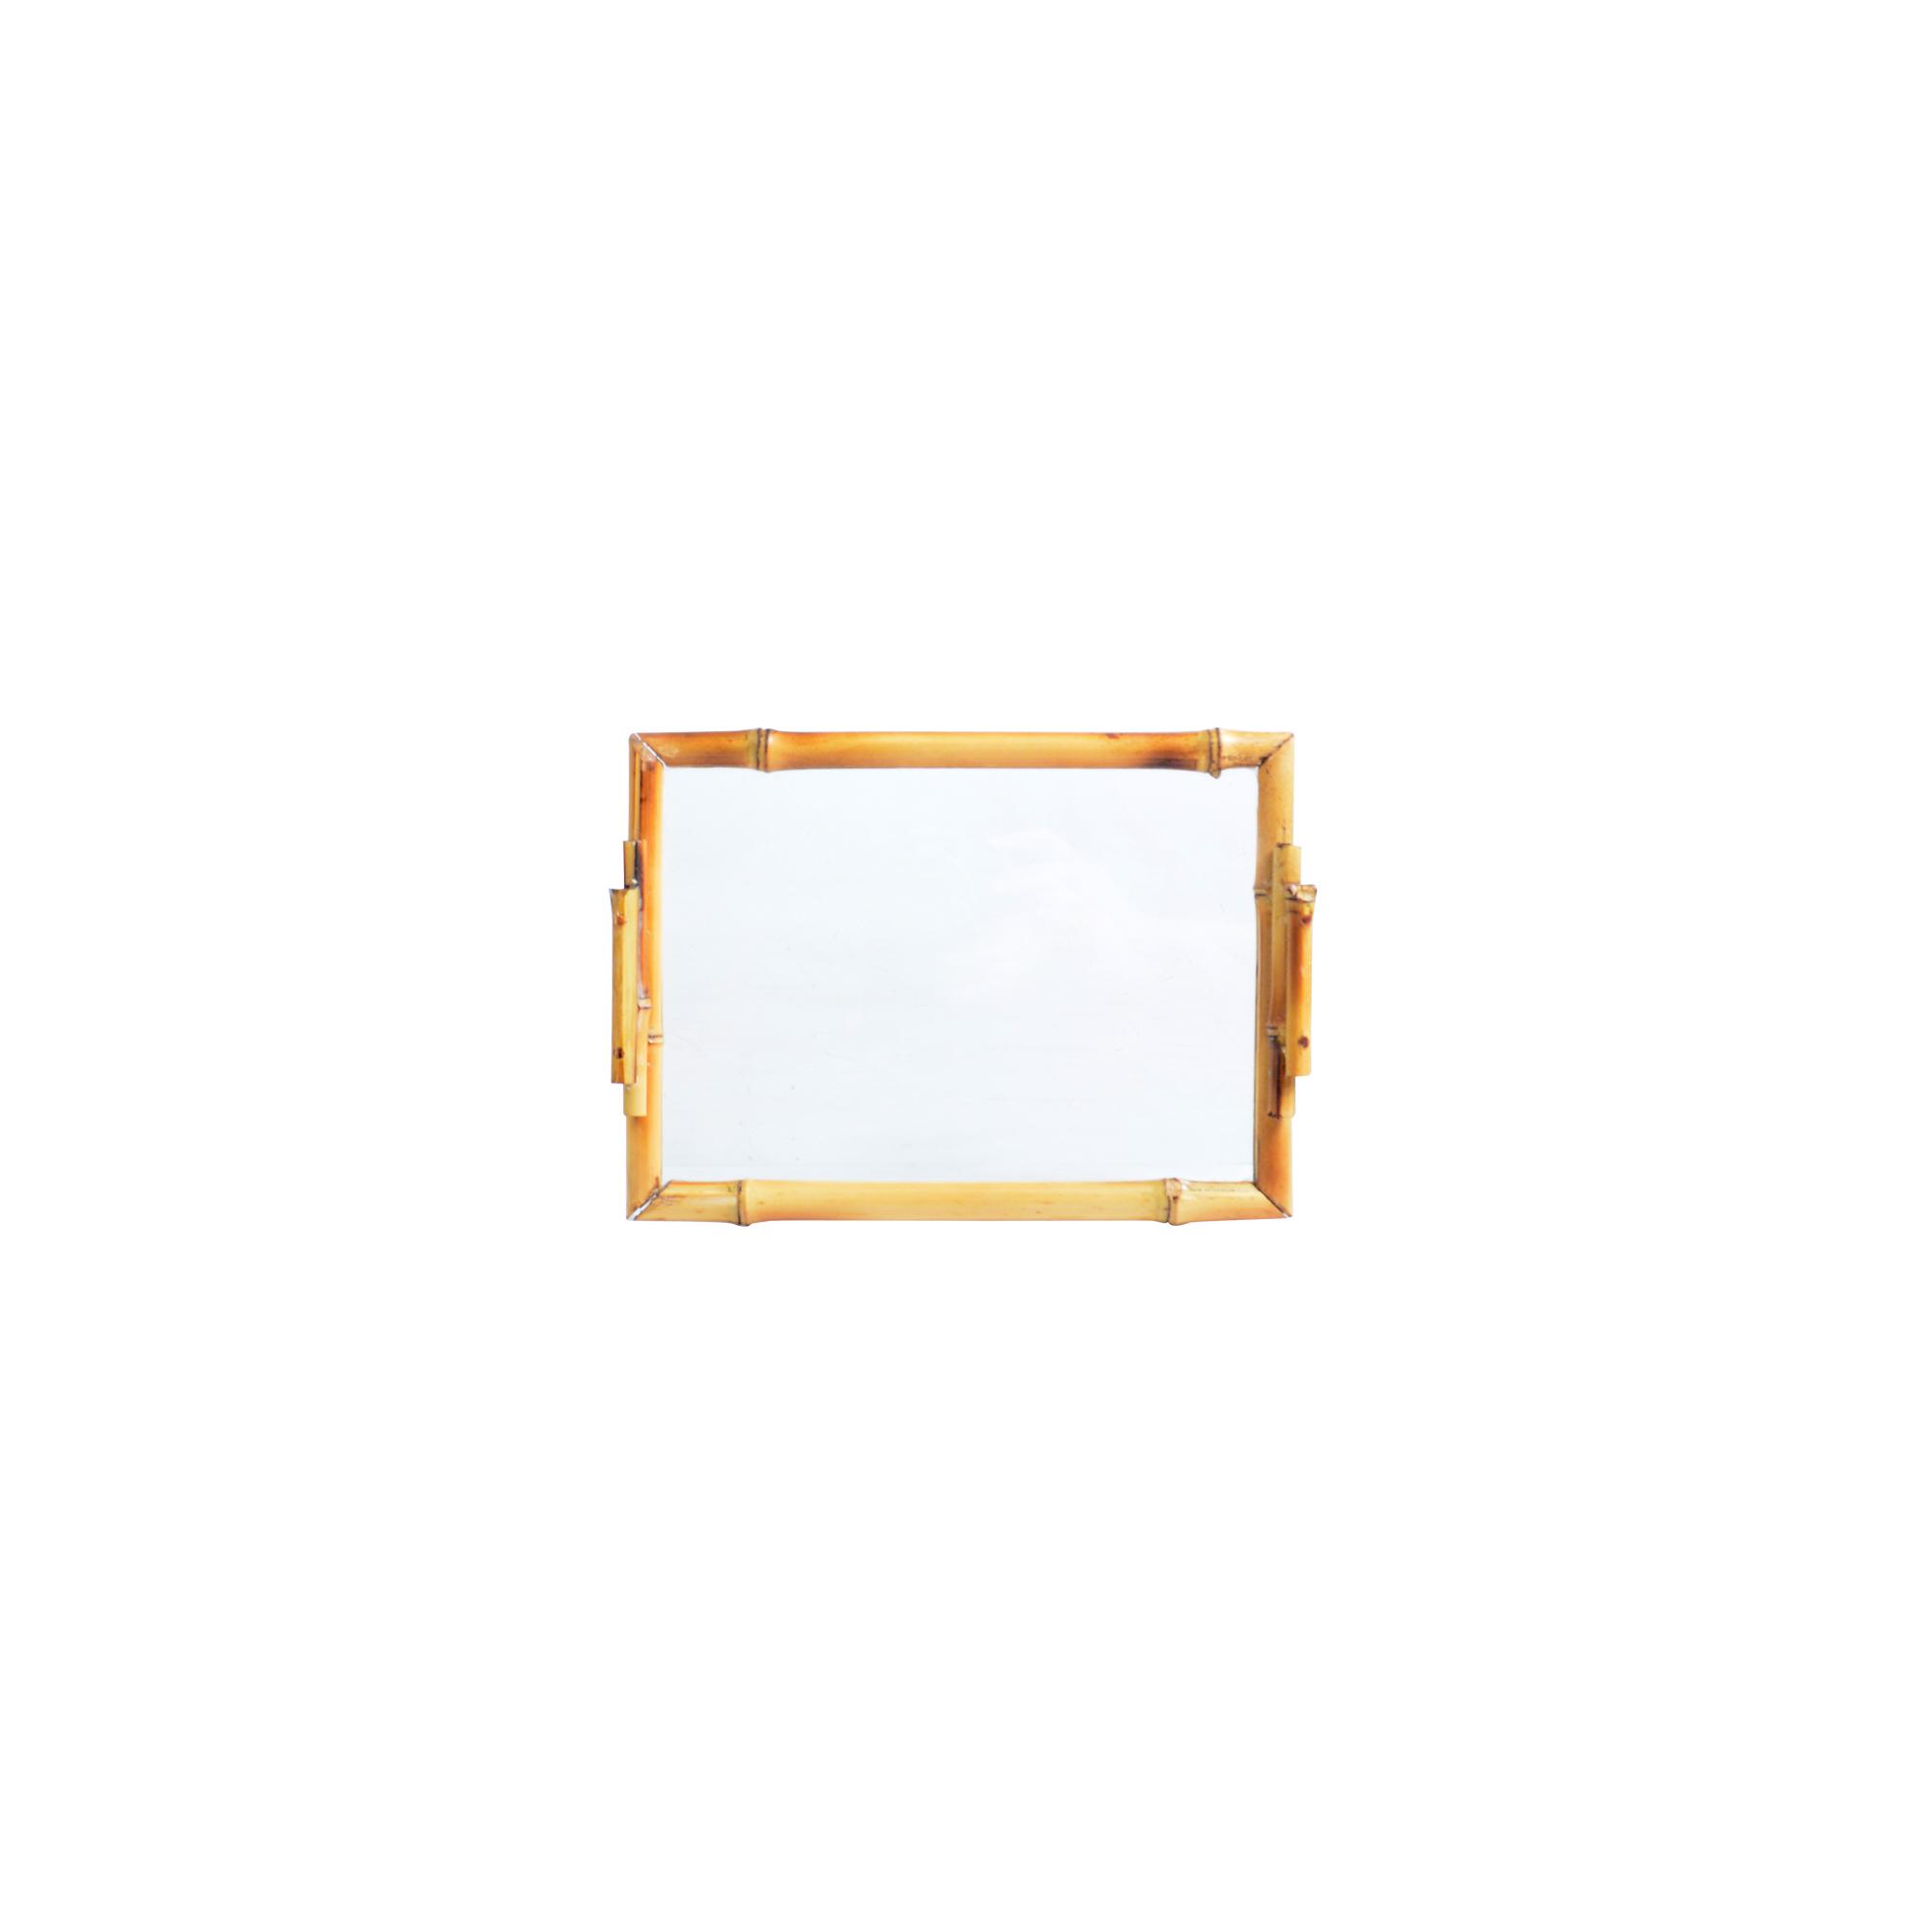 Bandeja de bambu com vidro retangular PP lisa